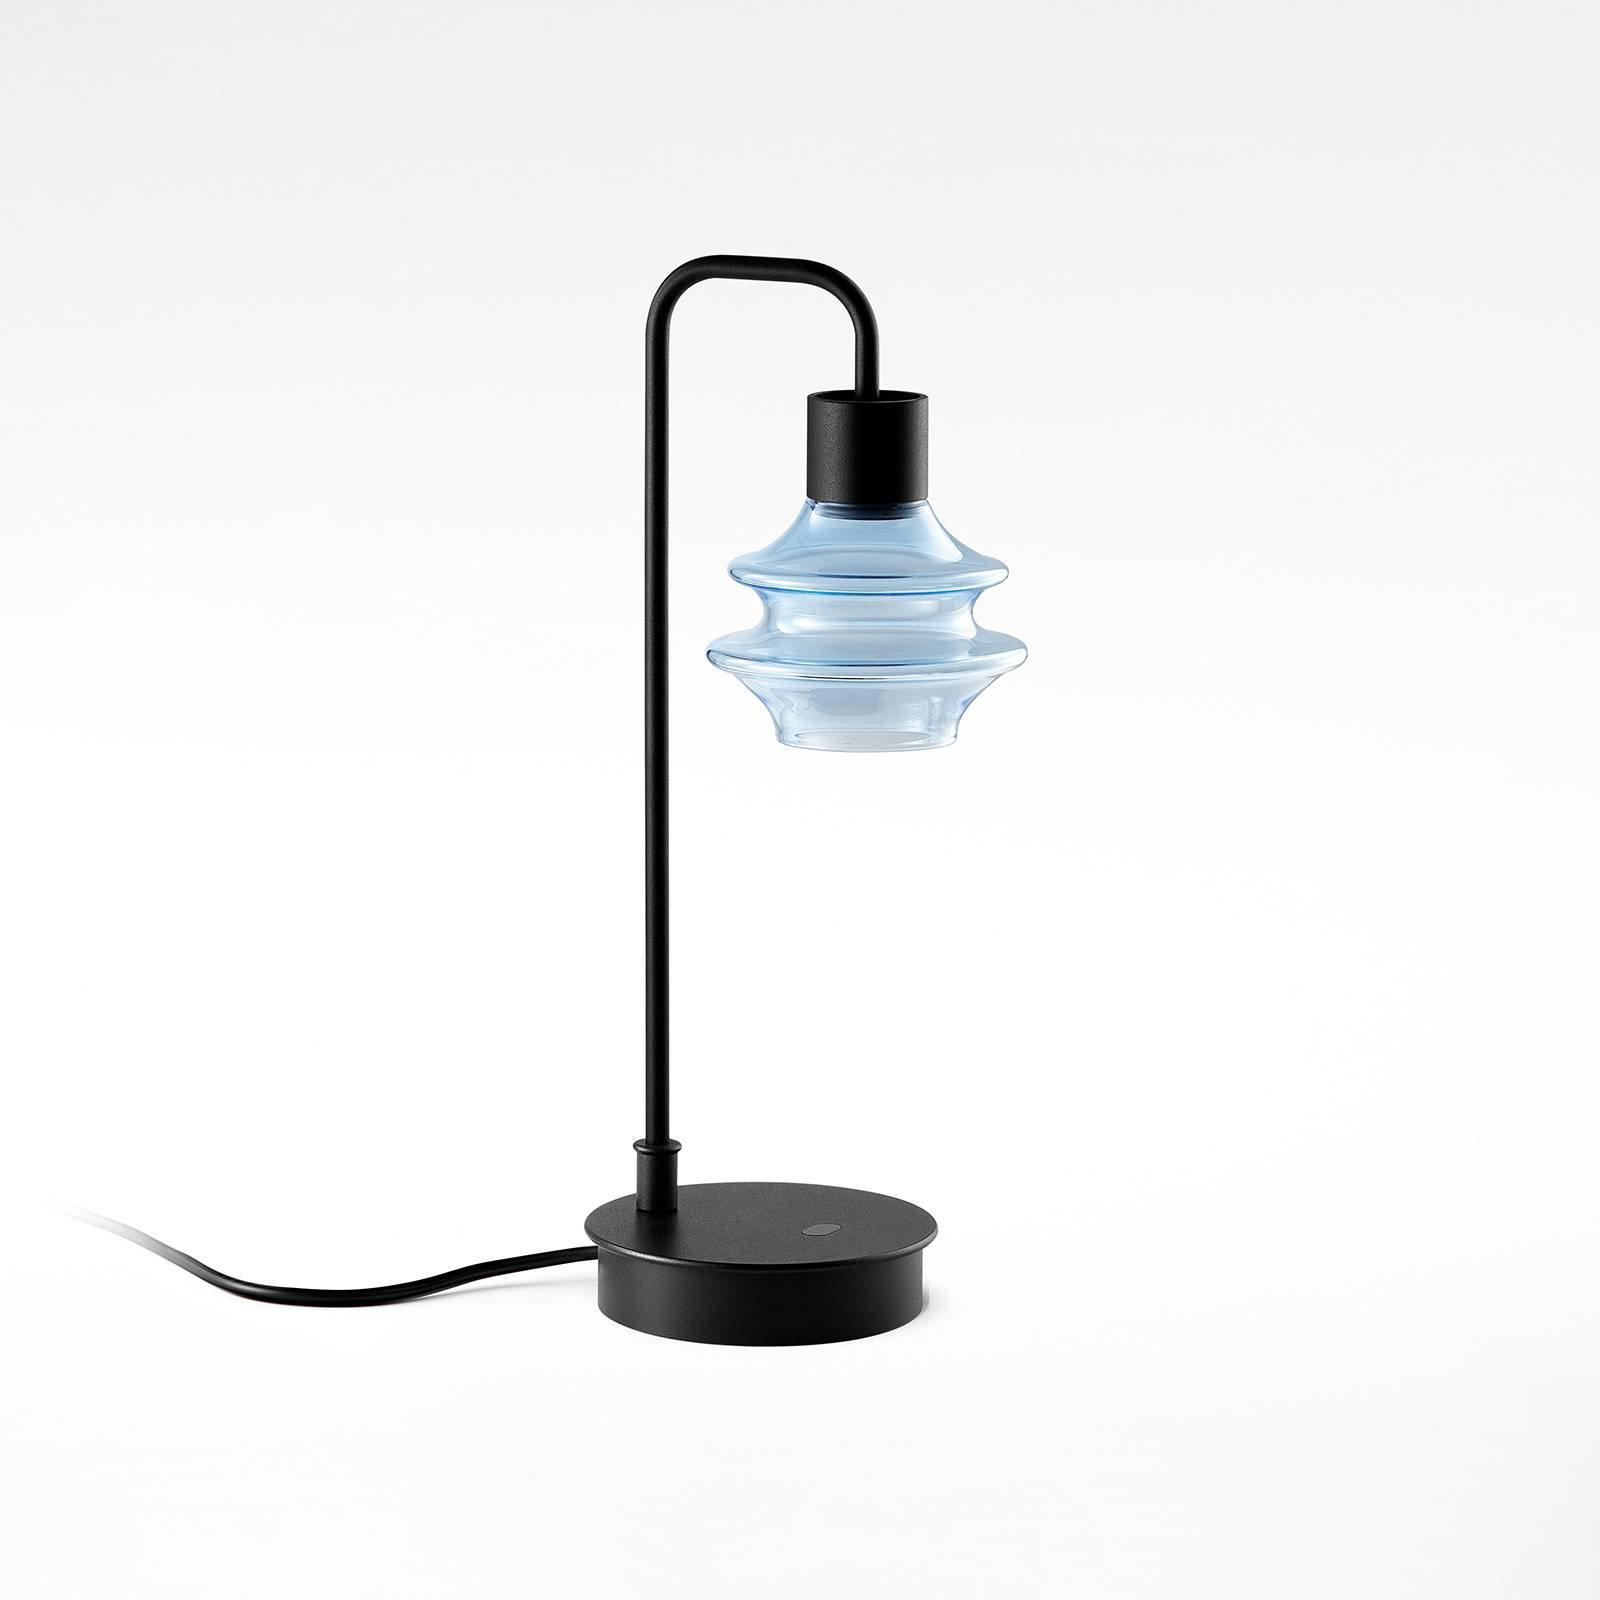 Bover Drop M/36 LED-bordlampe blå